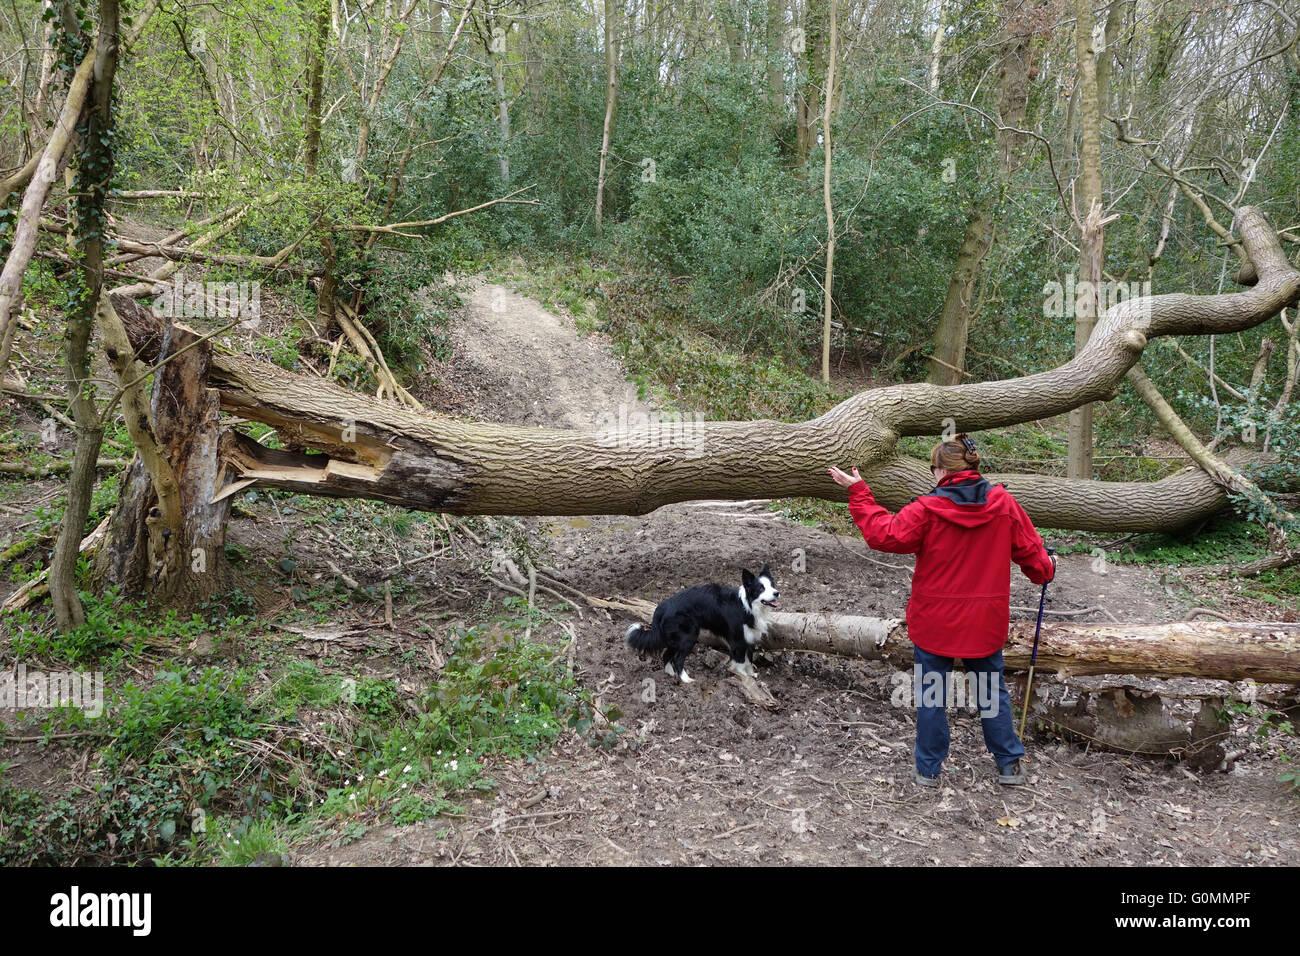 Fallen diseased Ash Tree in Shropshire Woodland England Uk Stock Photo